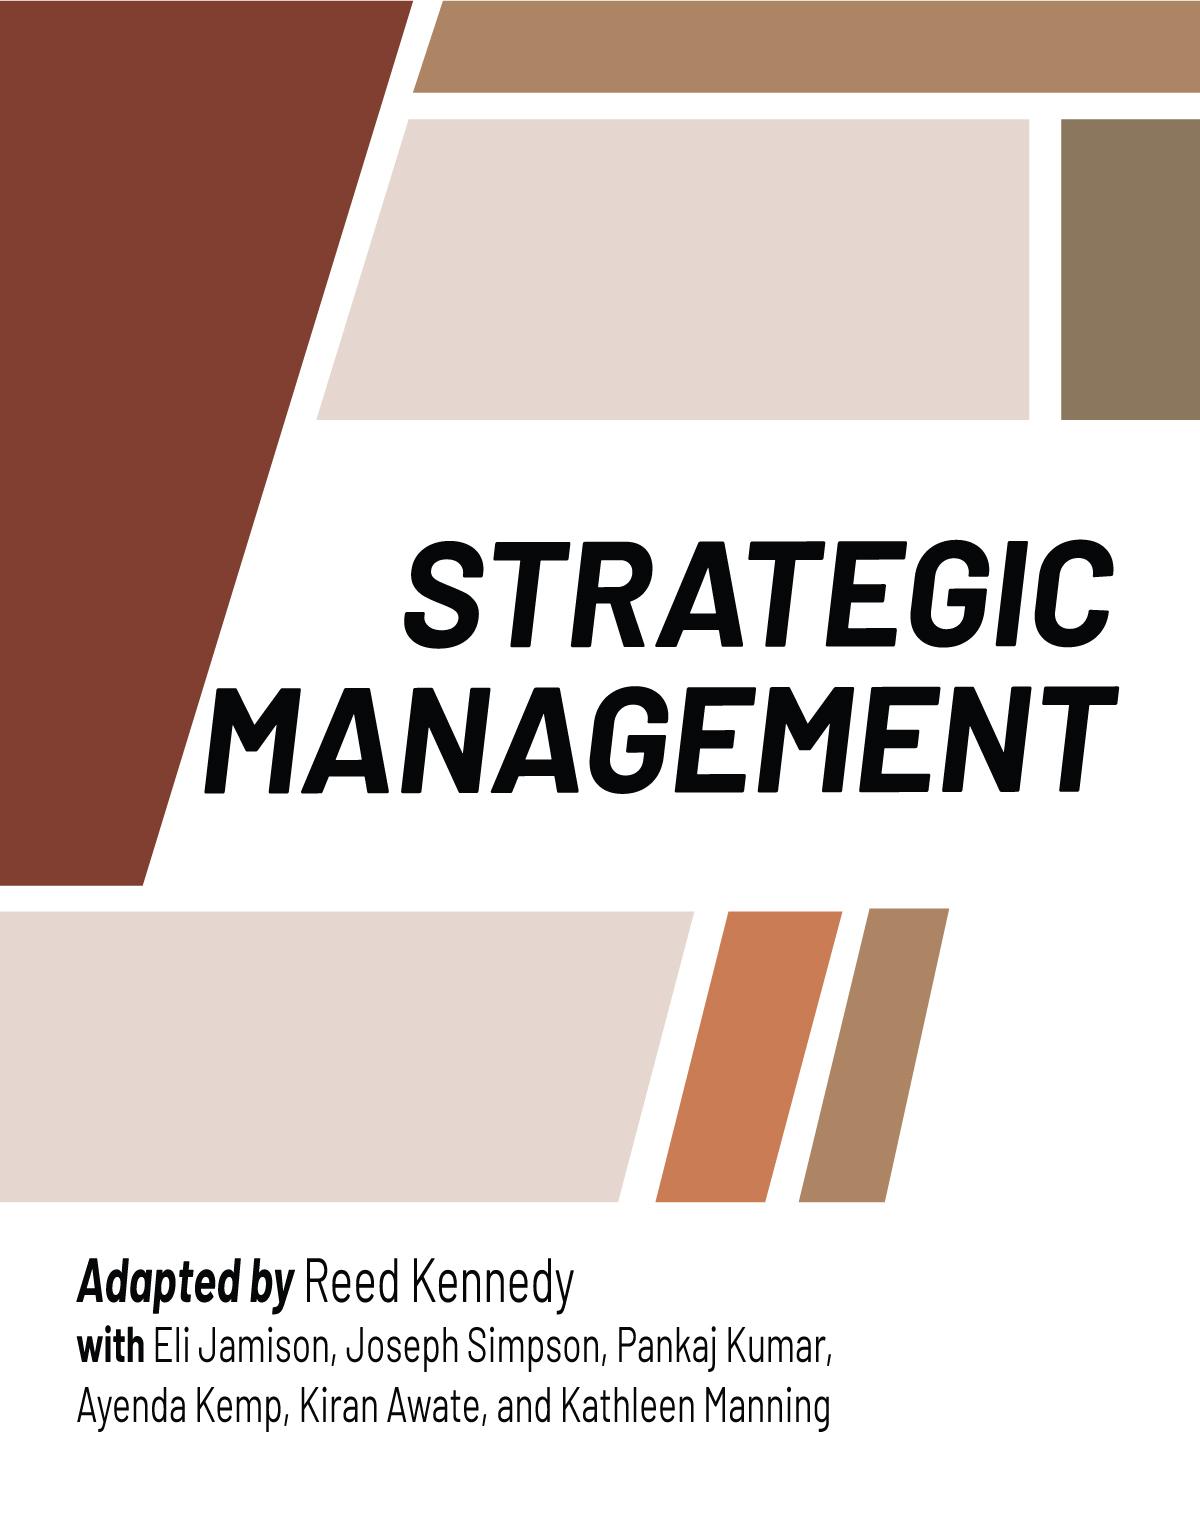 Cover of Strategic Managment, adapted by Reed Kennedy with Eli Jamison, Joseph Simpson, Pankaj Jumar, Aynda Kemp, Kiran Awate, and Kathleen Manning